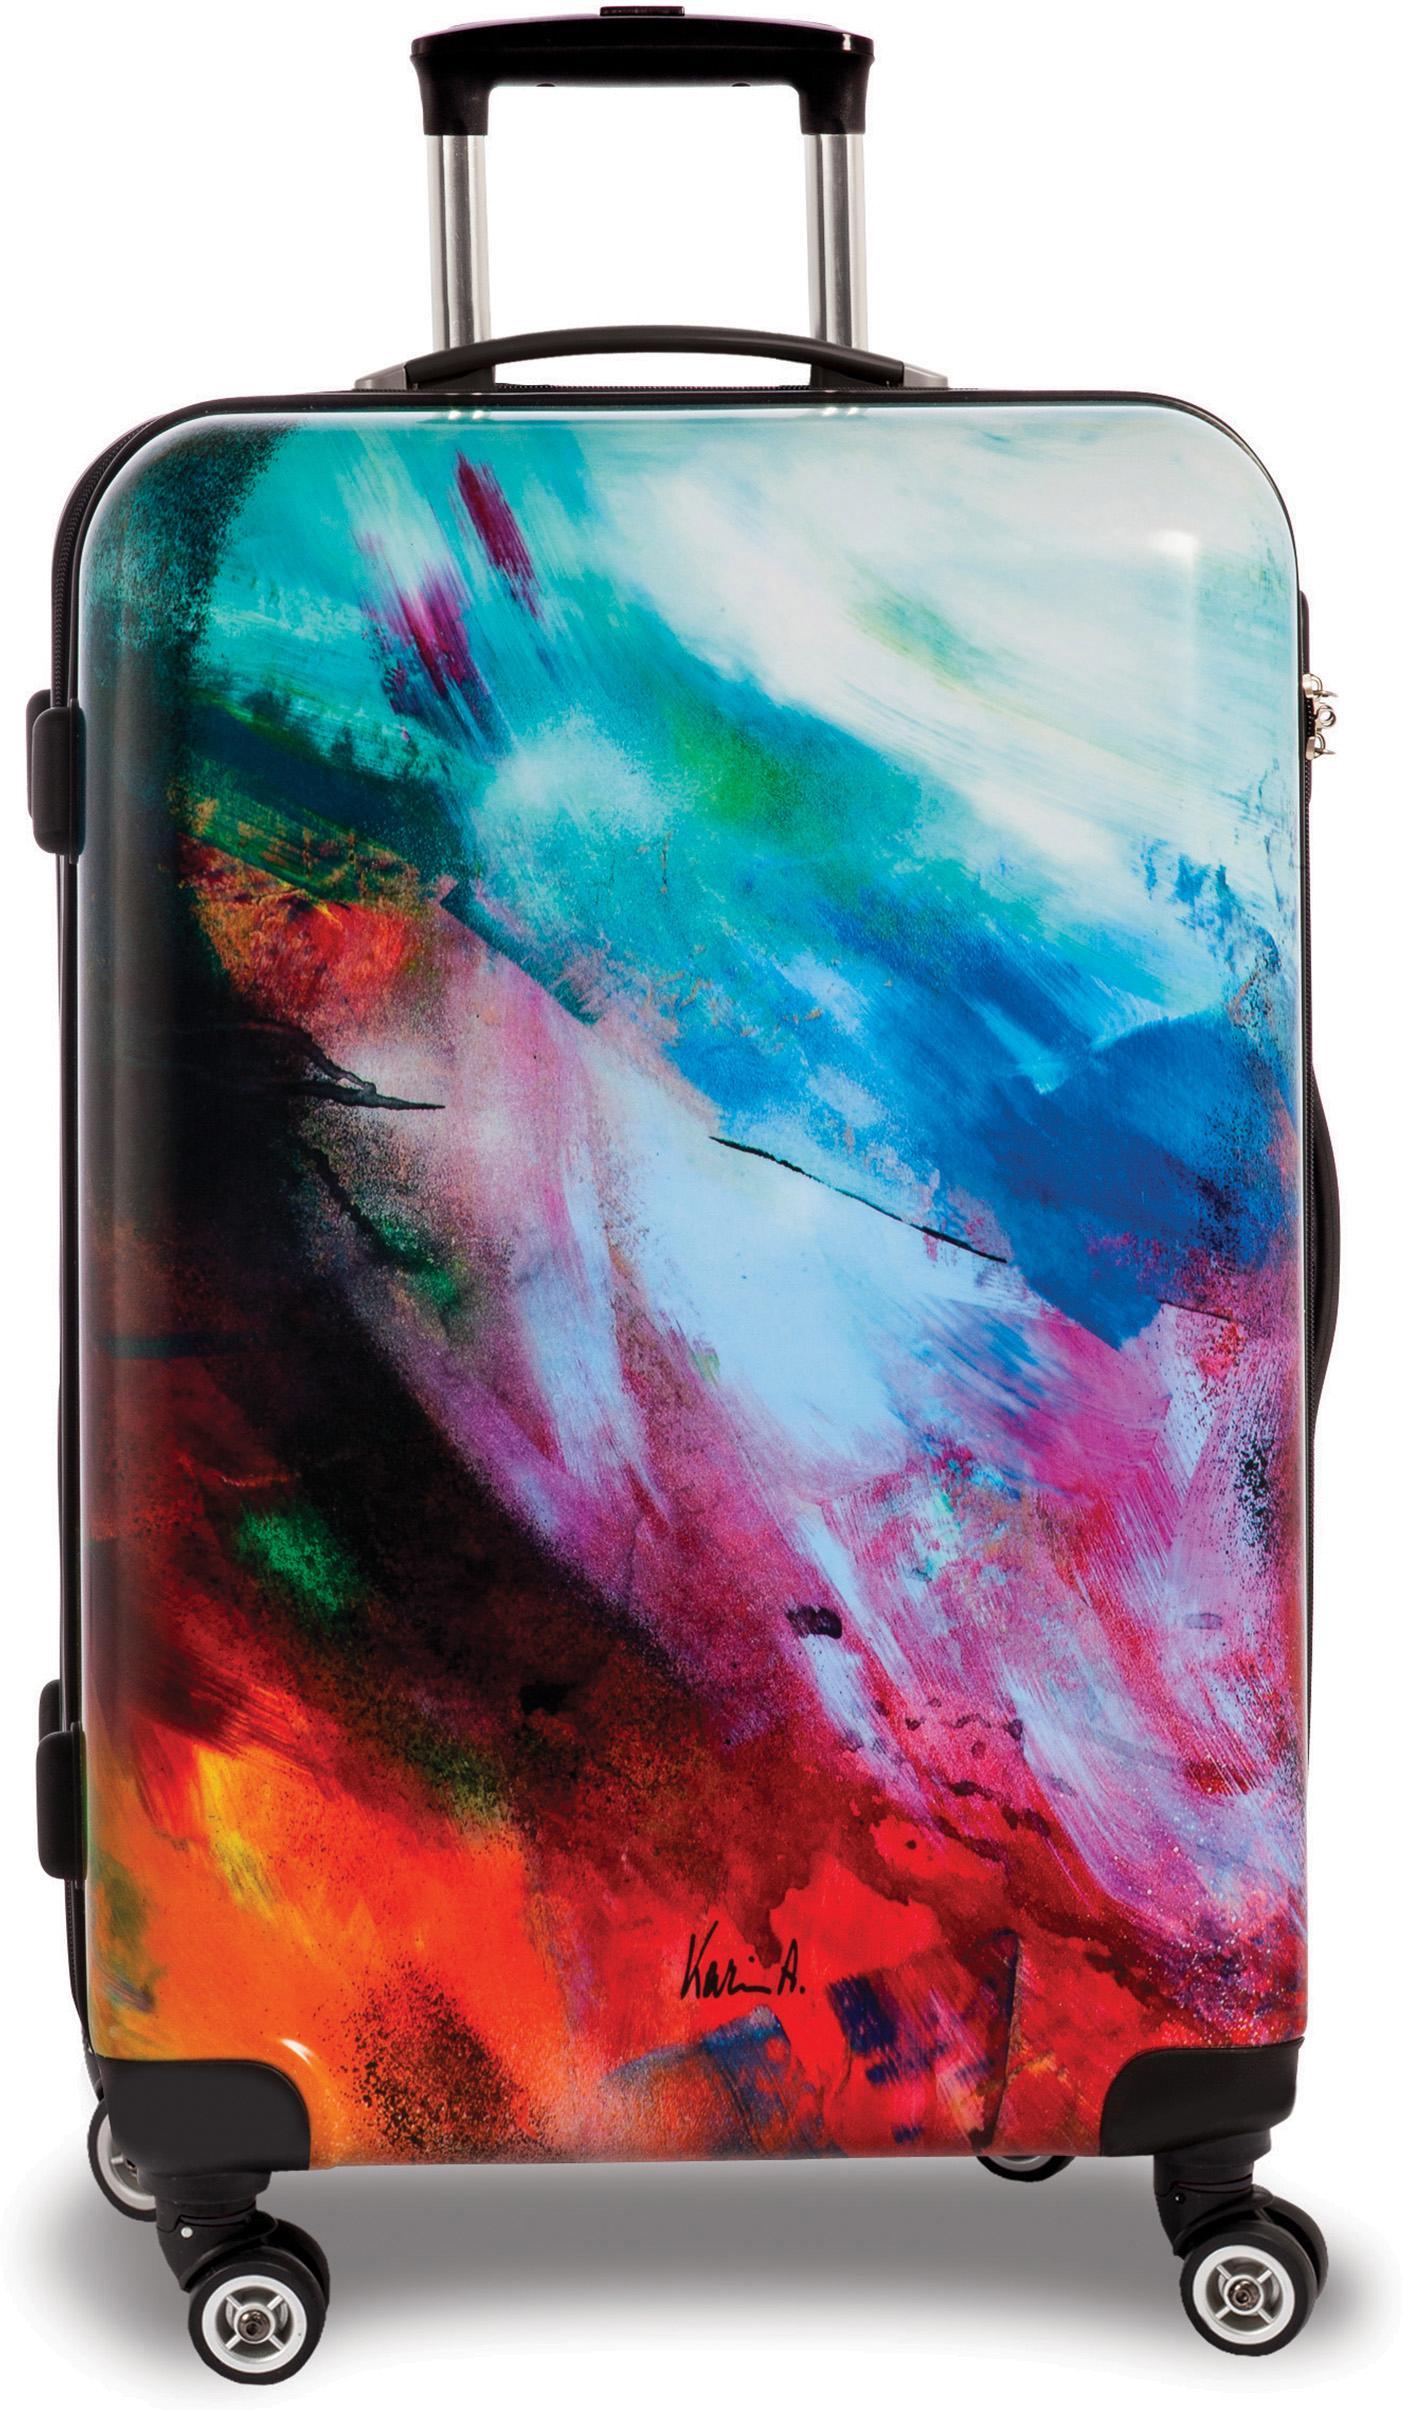 fabrizio® Hartschalen-Trolley Creative style Abstract, 67 cm, Abstract | Taschen > Koffer & Trolleys > Trolleys | Bunt | FABRIZIO